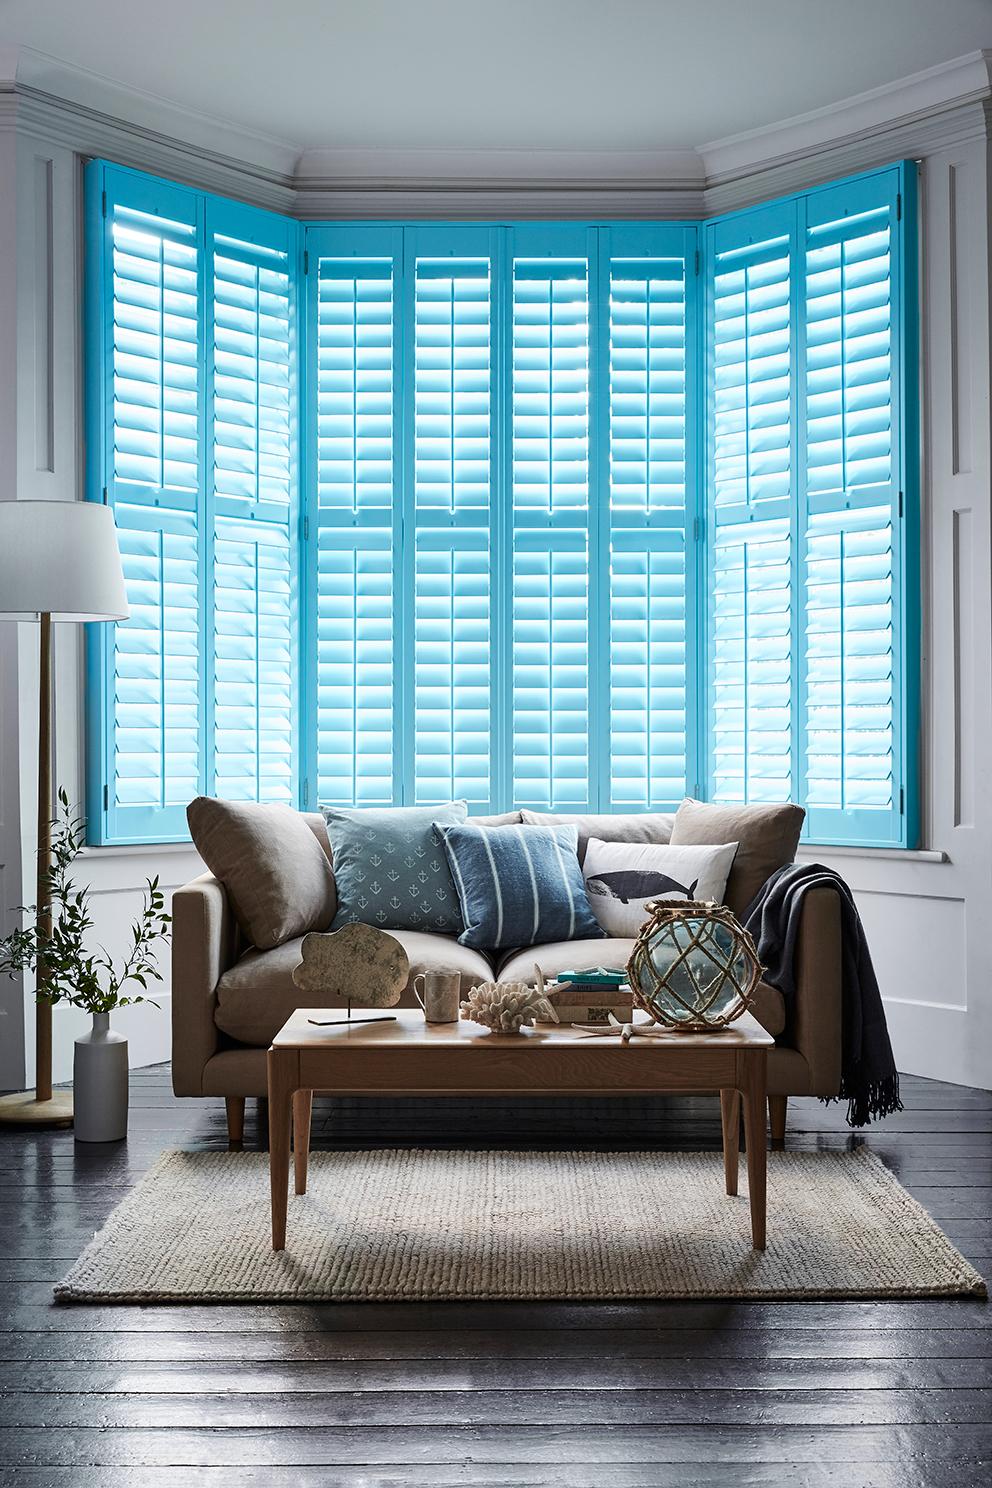 Shutterly Fabulous - French For Pineapple Blog - Full lenghth blue plantation shutters in bay window